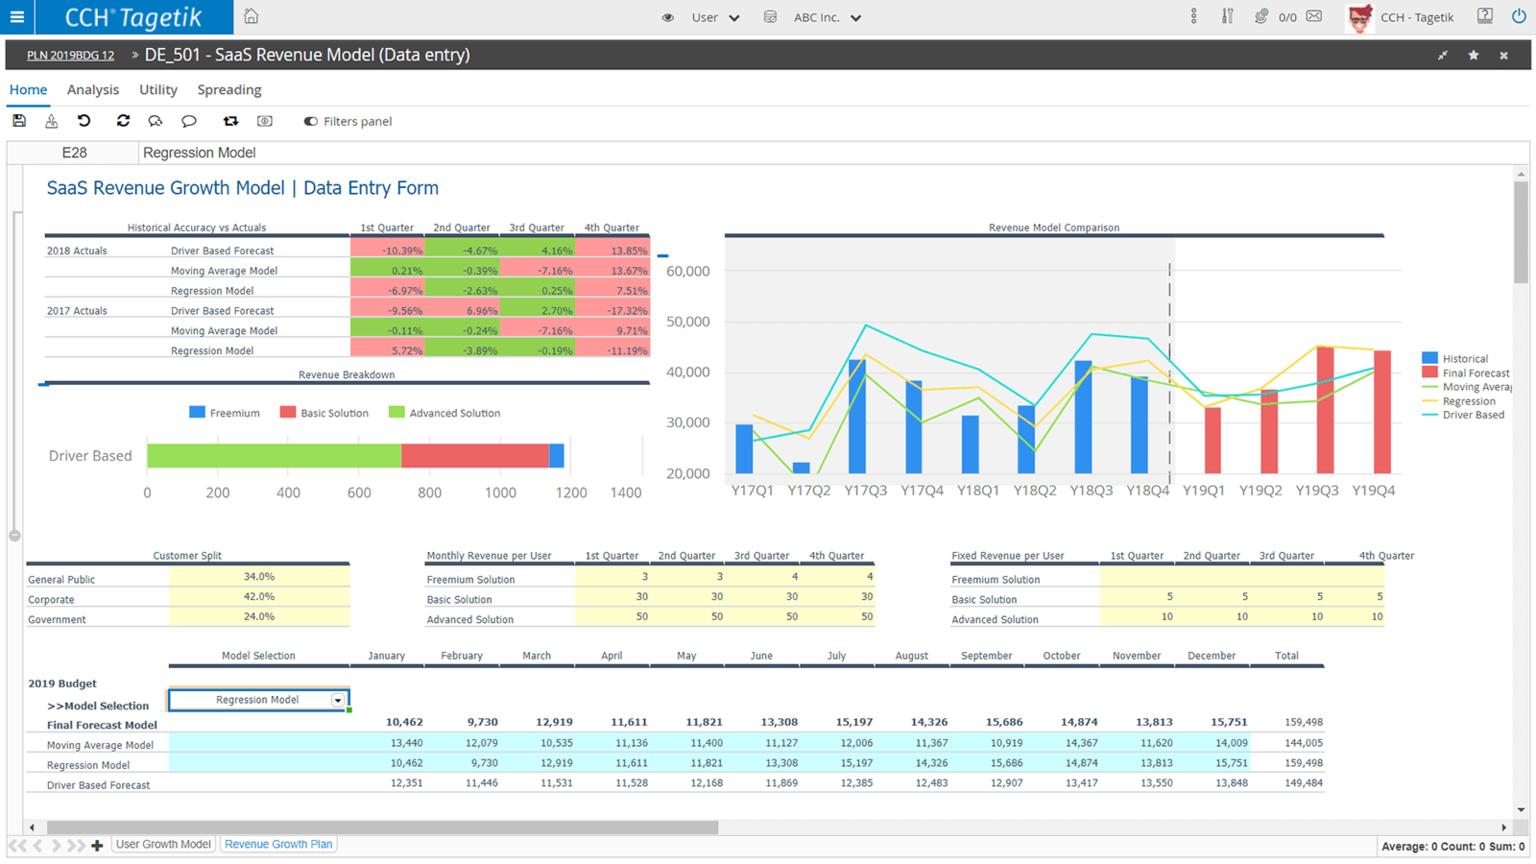 CCH Tagetik advanced analytics dashboarding